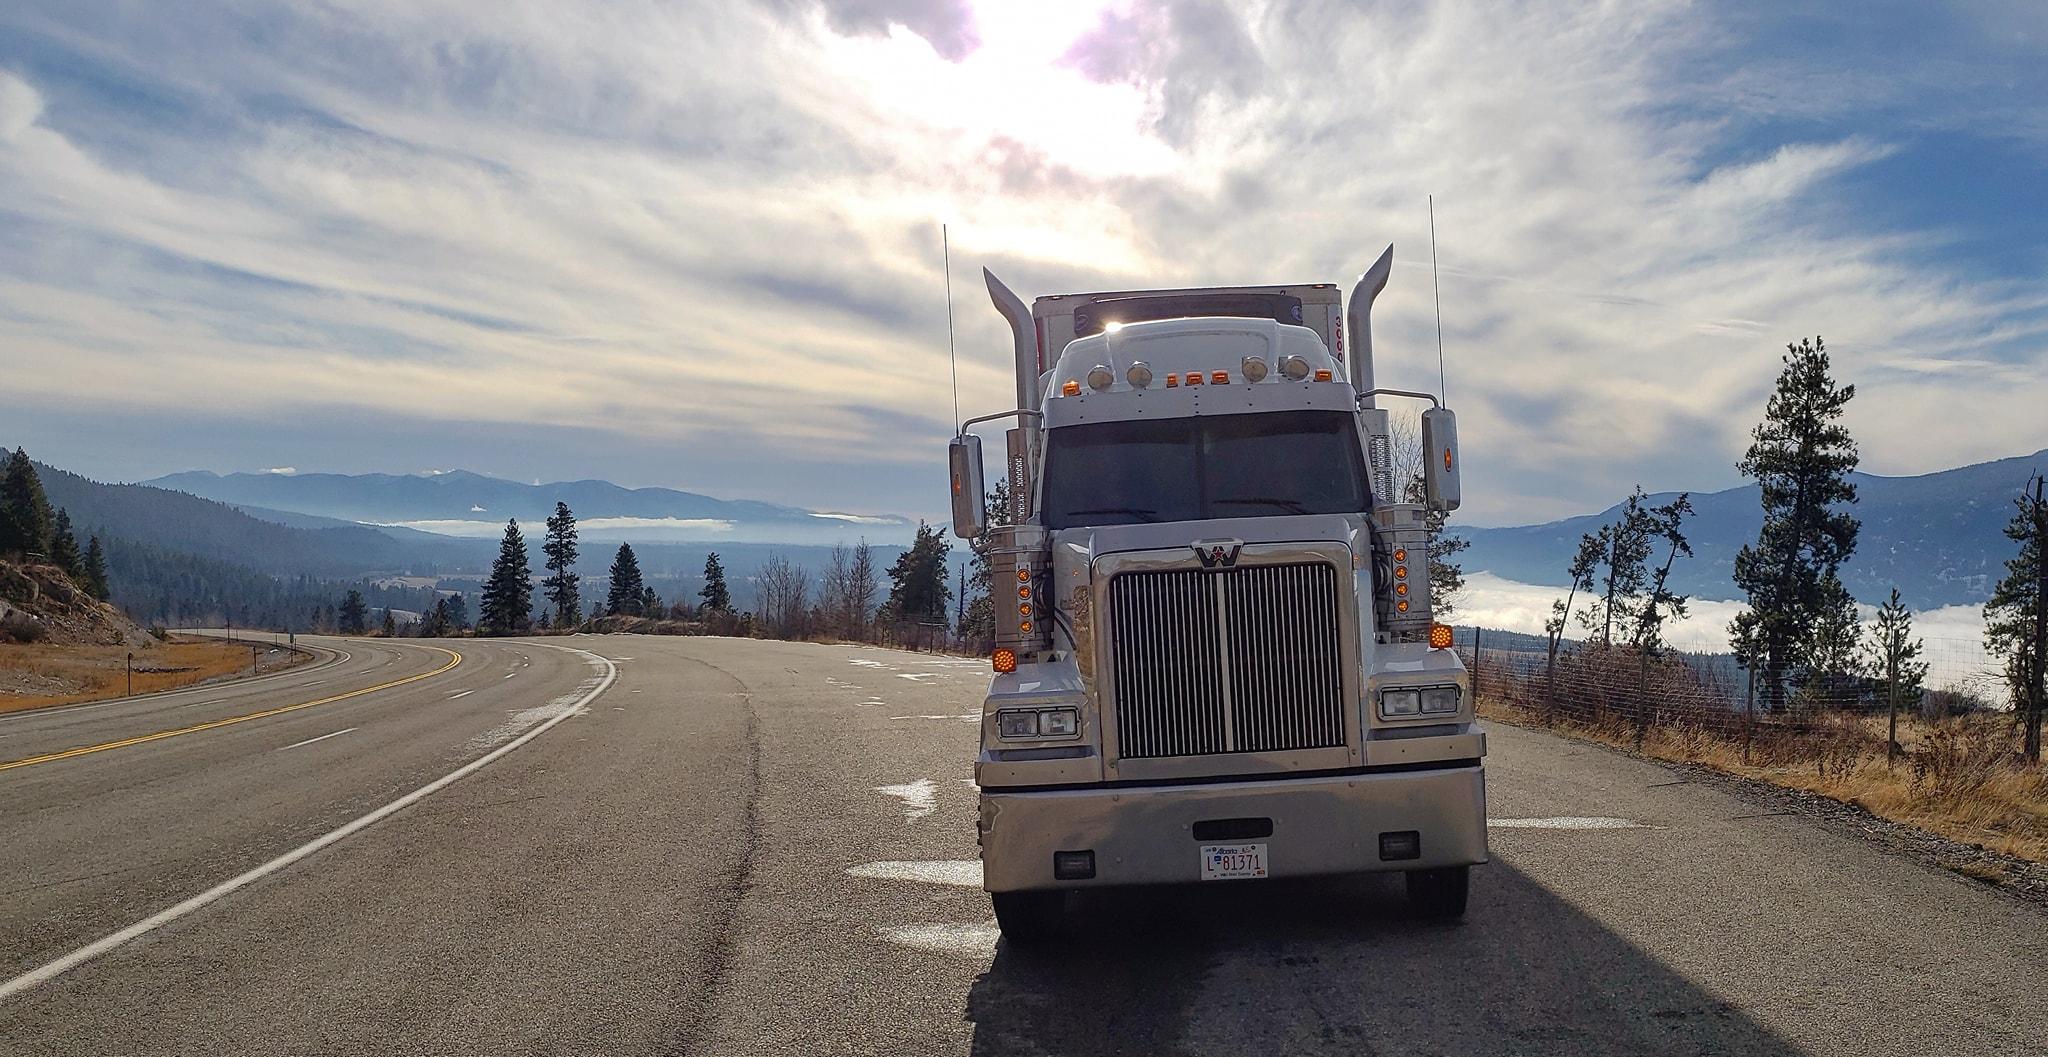 6-1-2019-rondreis-van-2800-km-Montana-Idaho-Oregon-Washington-(13)